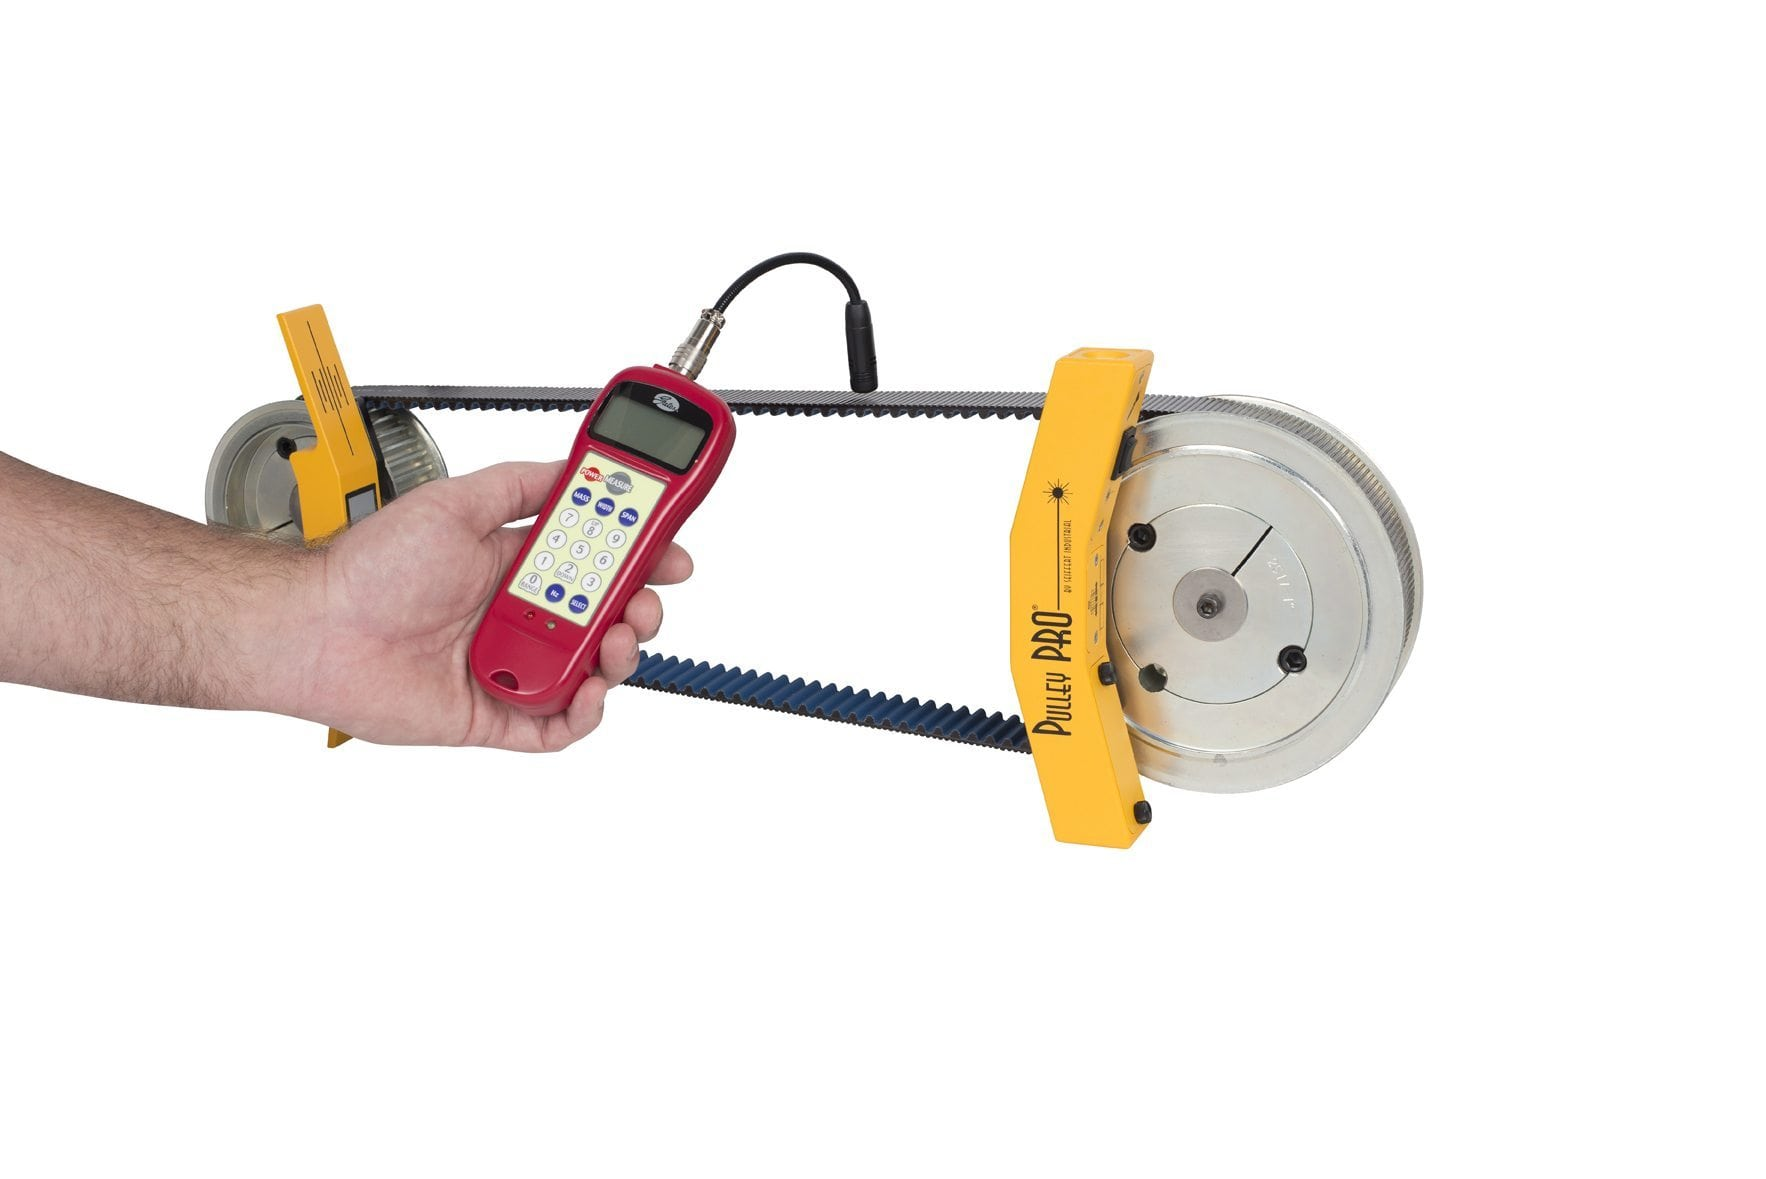 Belt Tension Meter : Sonic belt tension meter measure vibration frequency